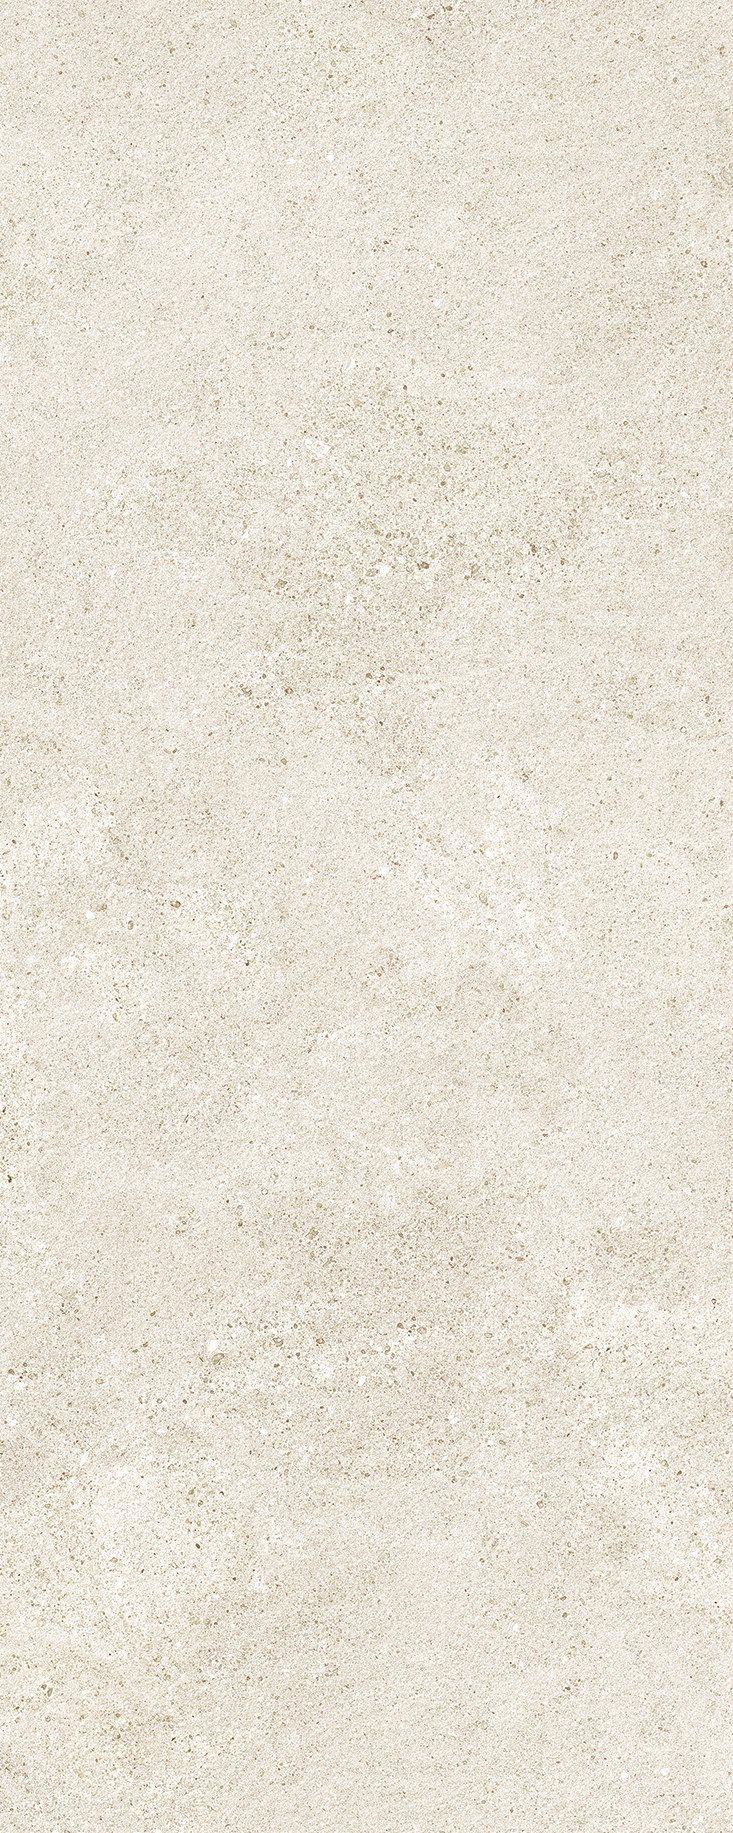 Masai Blanco Plus Abujardado / Bush-hammered 100x250 cm